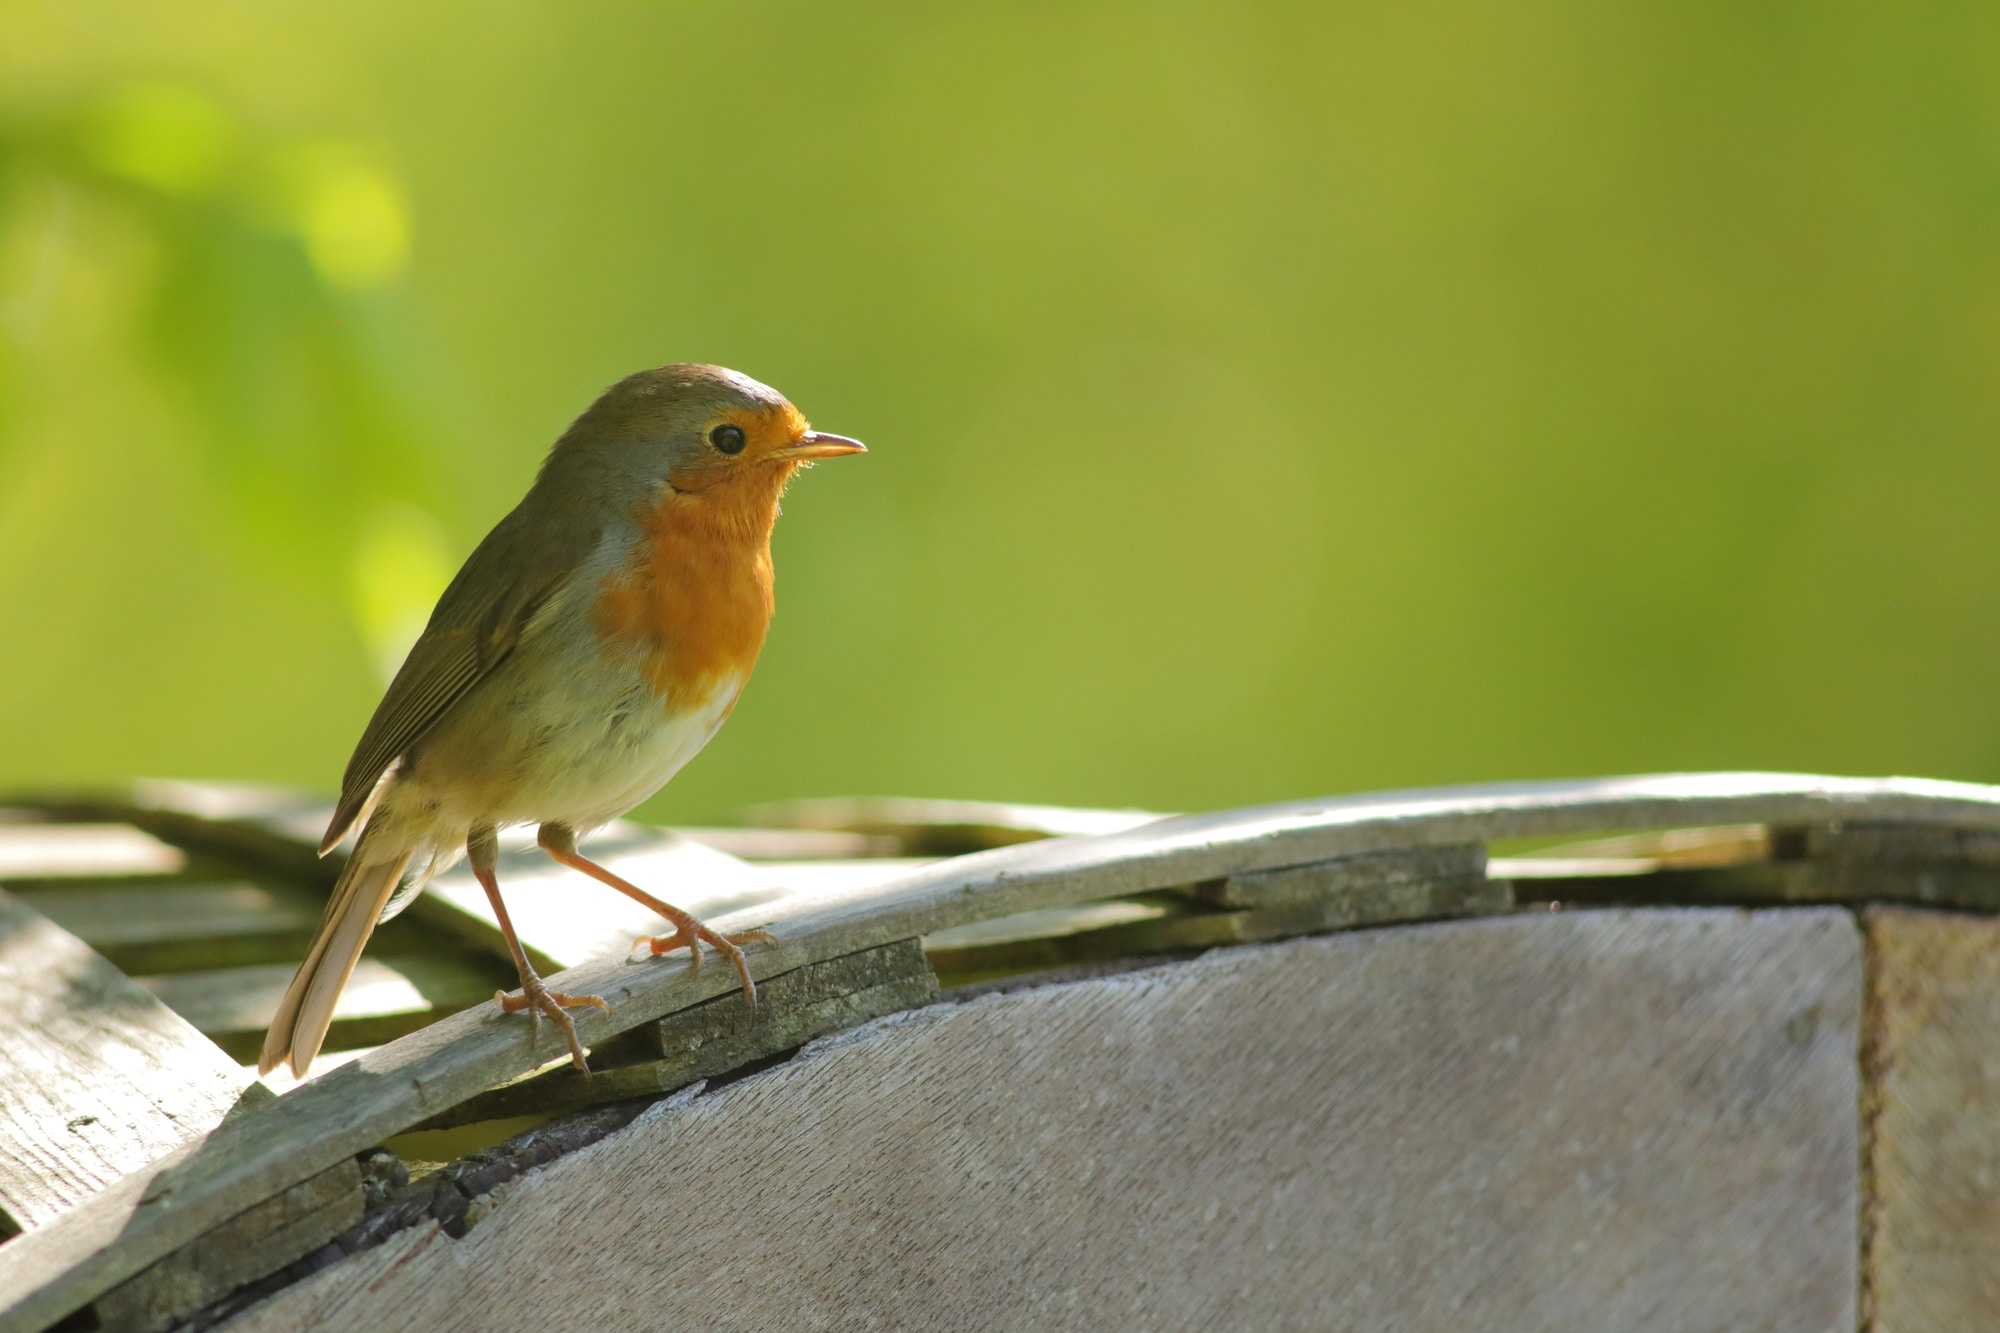 A male robin